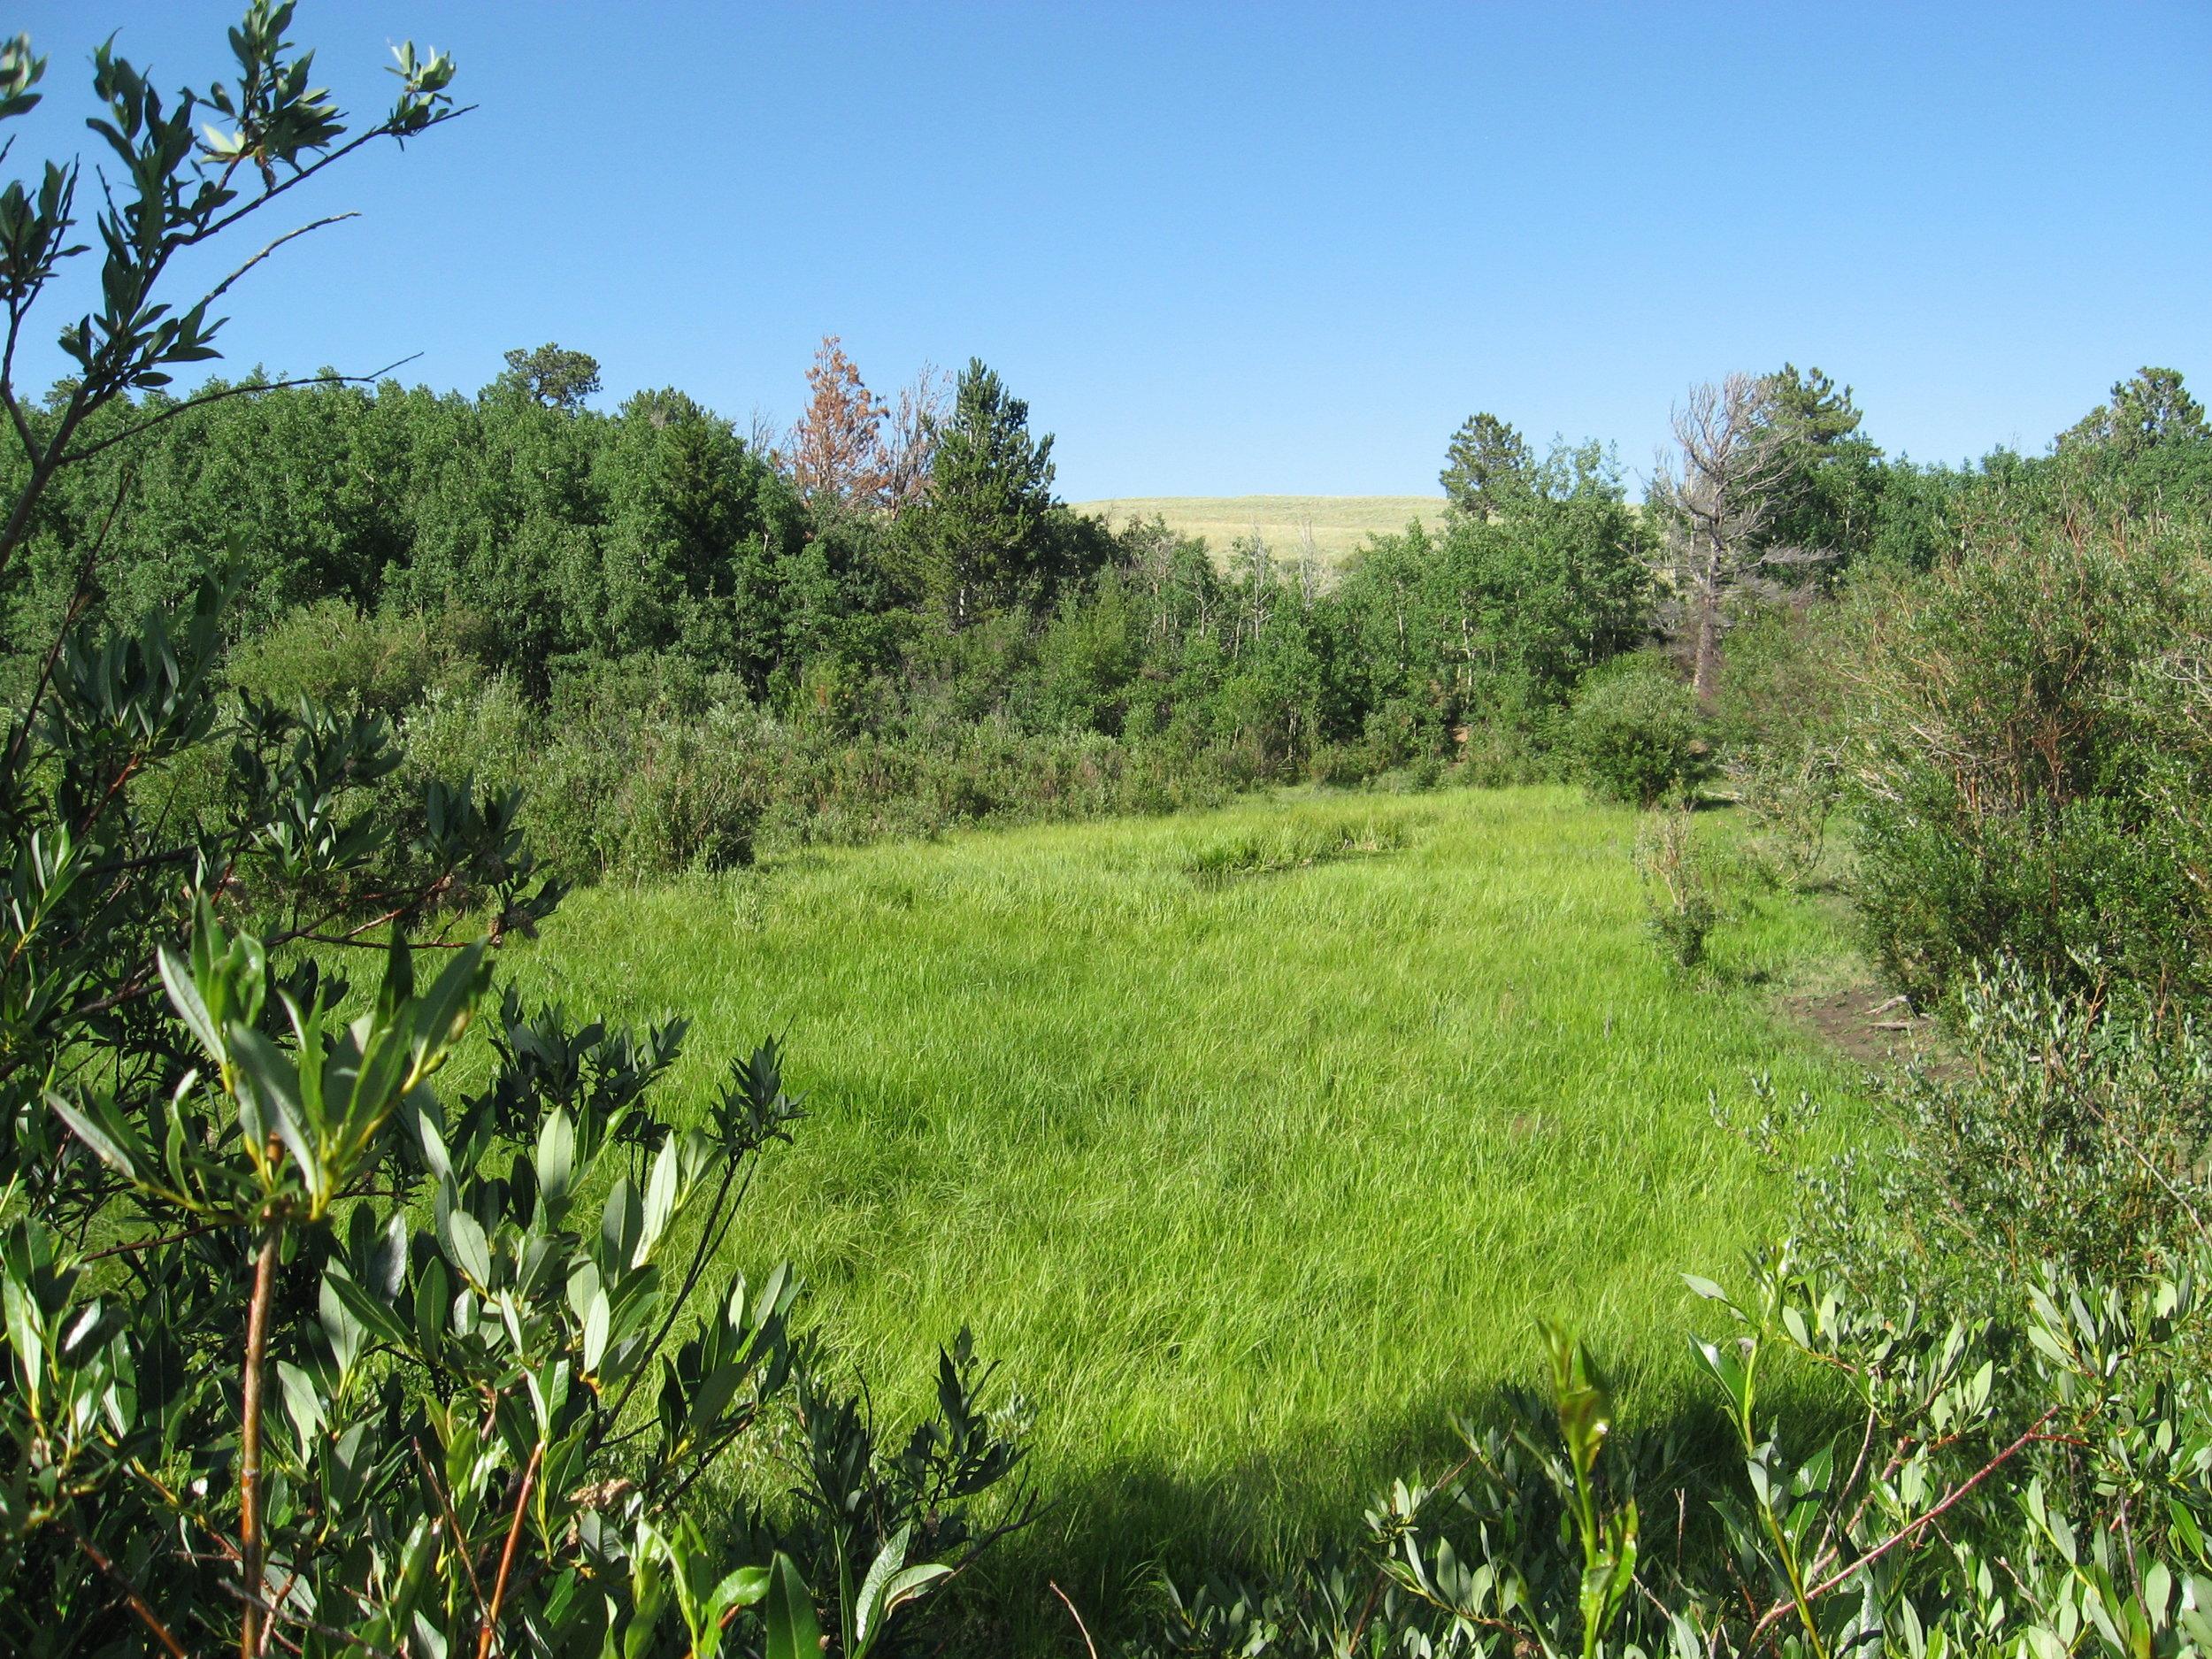 Wyoming Wet Meadow